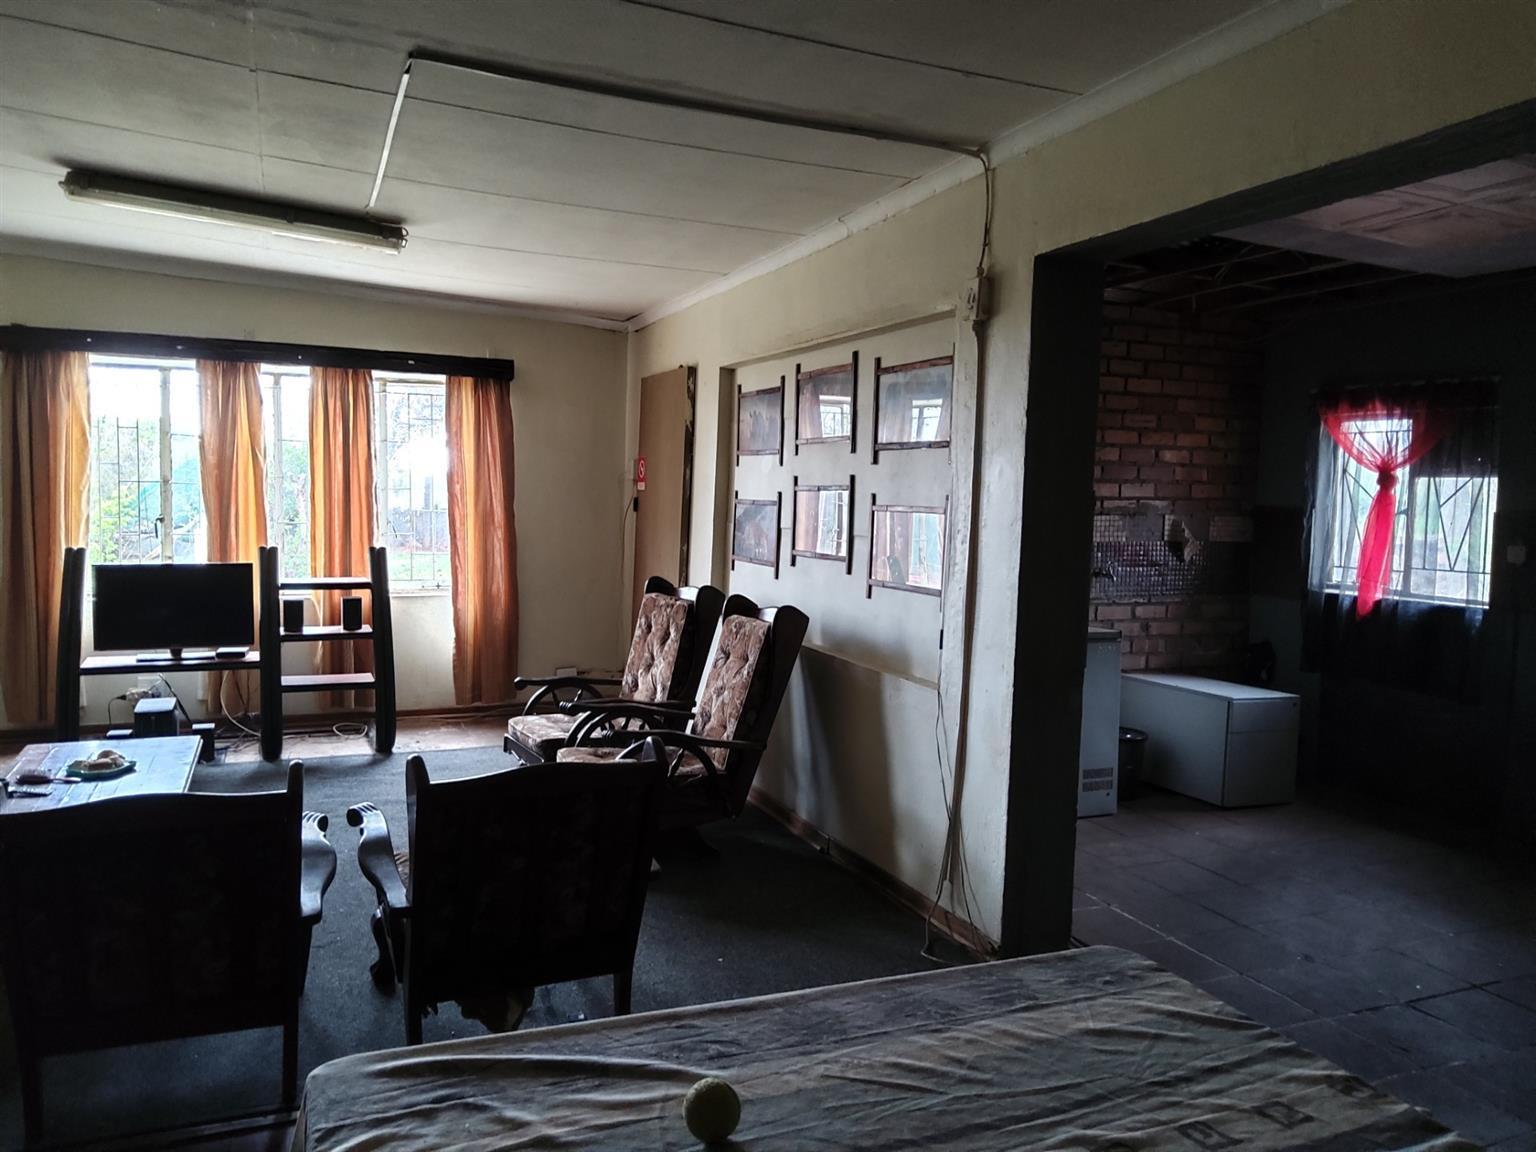 House For Sale in Myngenoegen AH